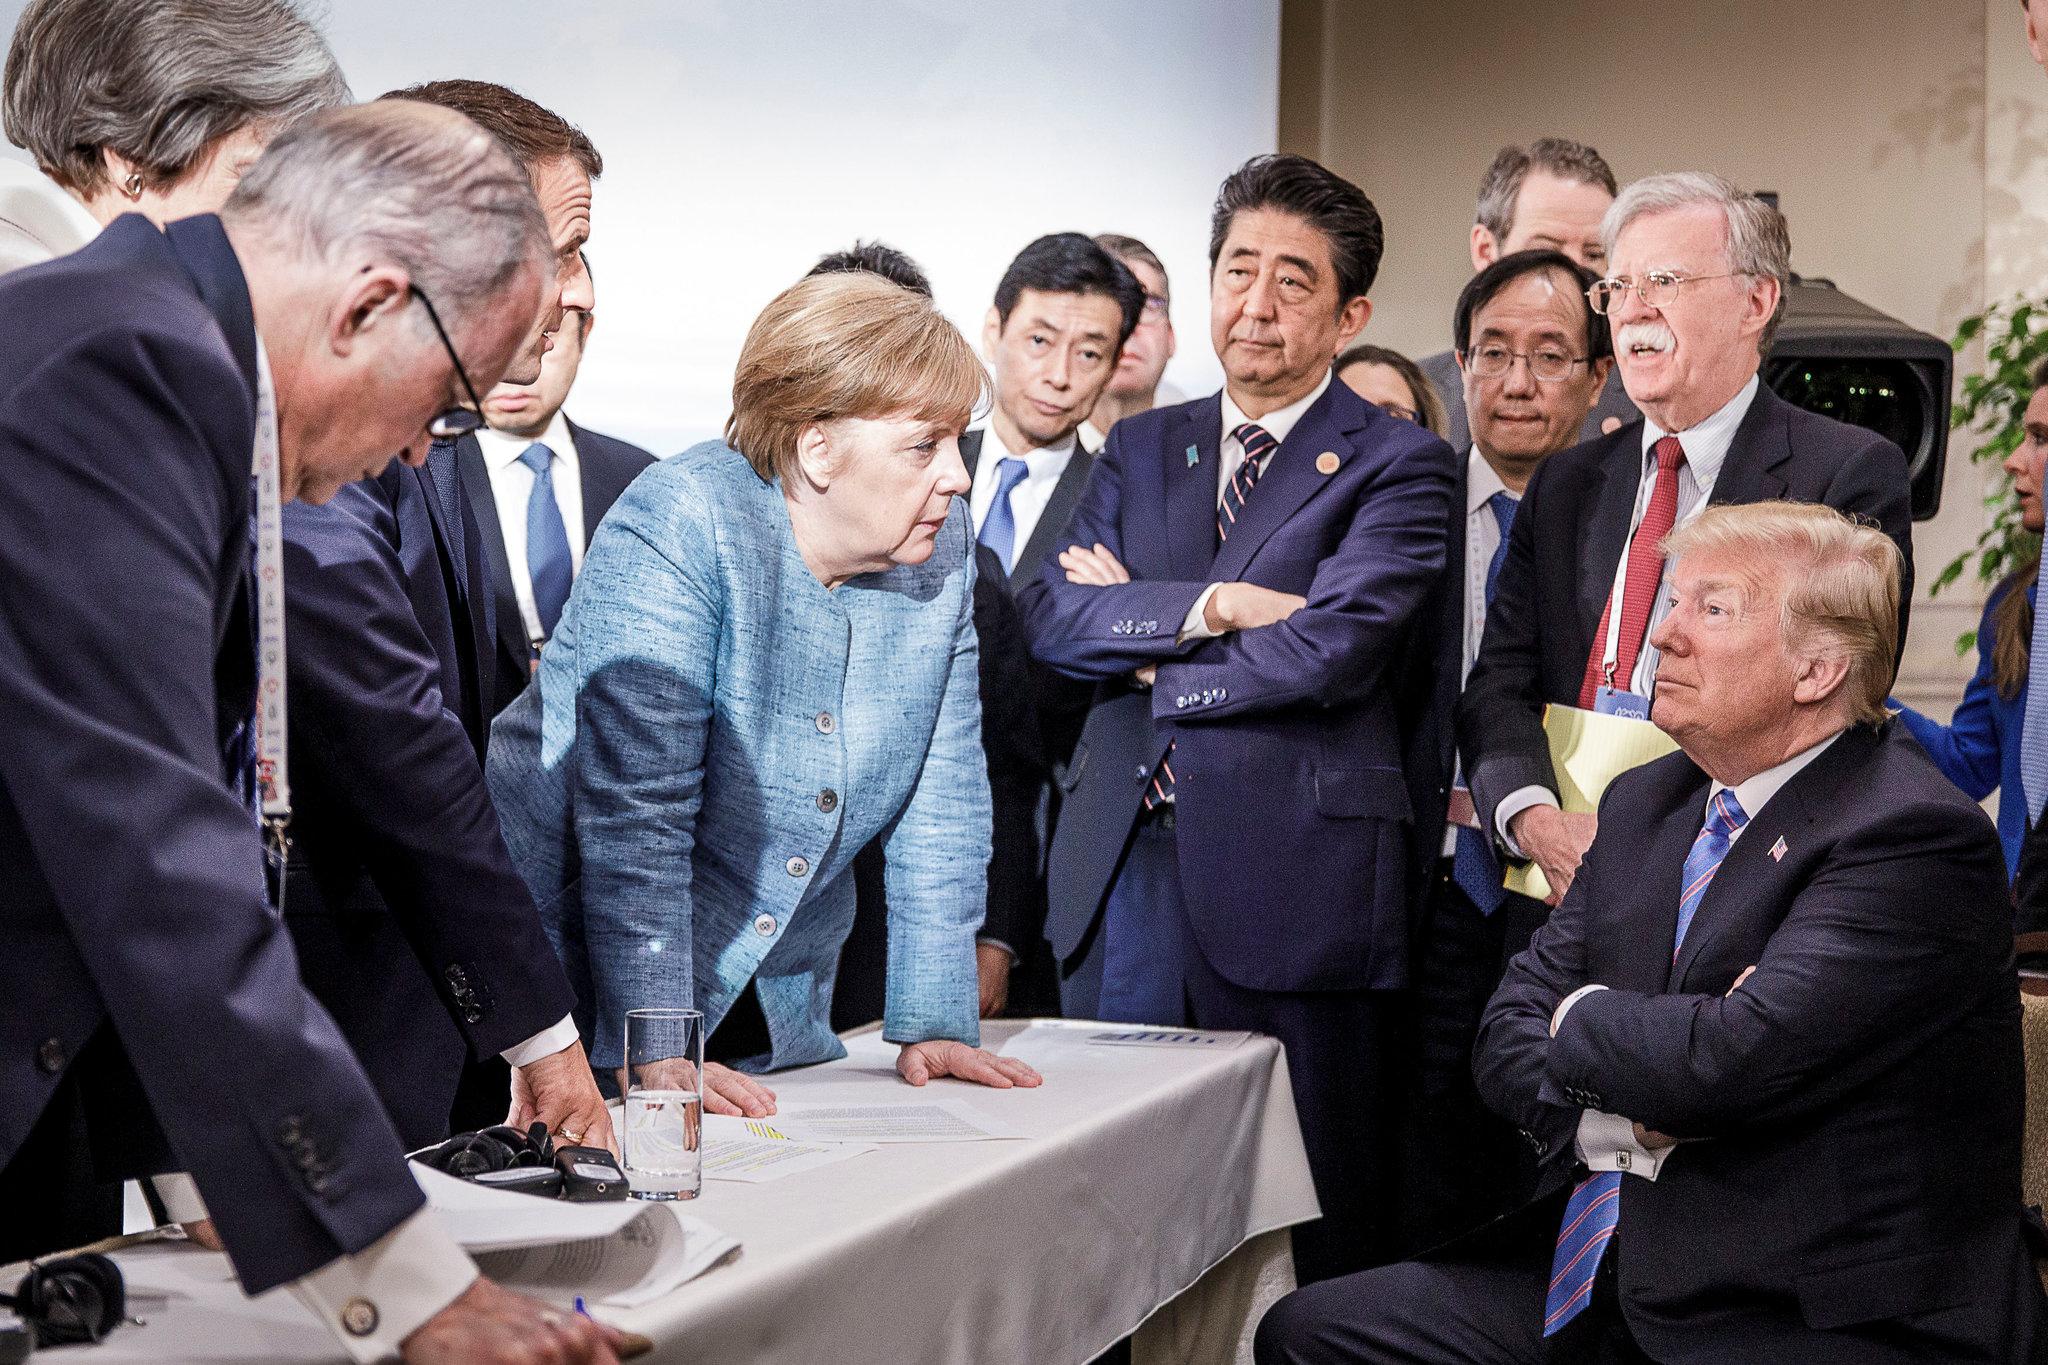 Angela Merkel at G7